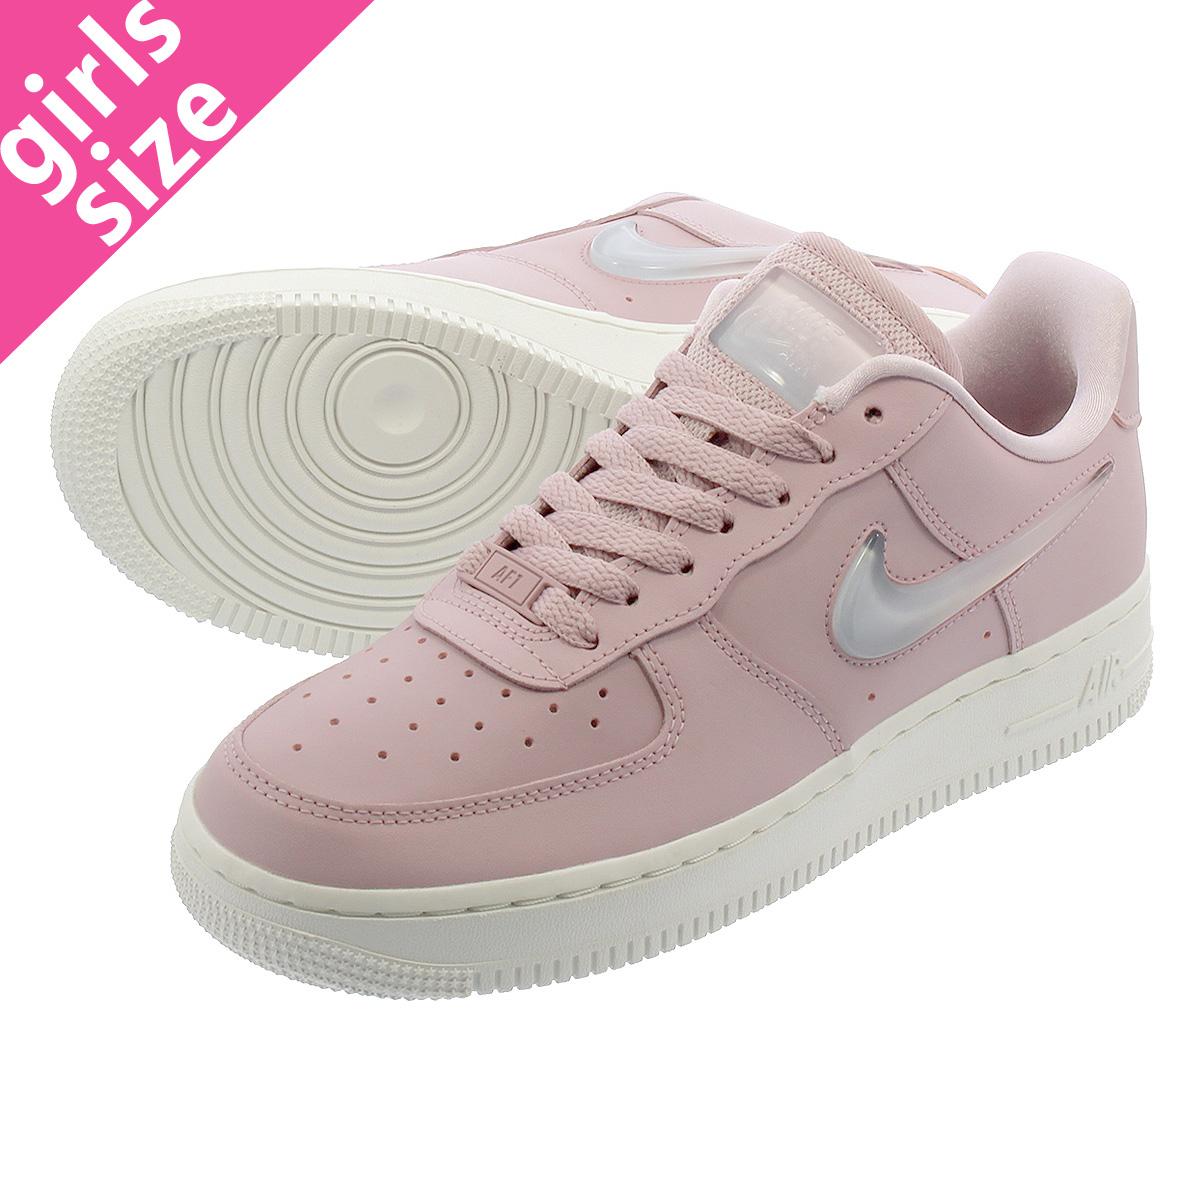 NIKE WMNS AIR FORCE 1 '07 SE PRM Nike women air force 1 '07 SE PRM PLUM CHALKOBSIDIAN MISTSUMMIT WHITE ah6827 500